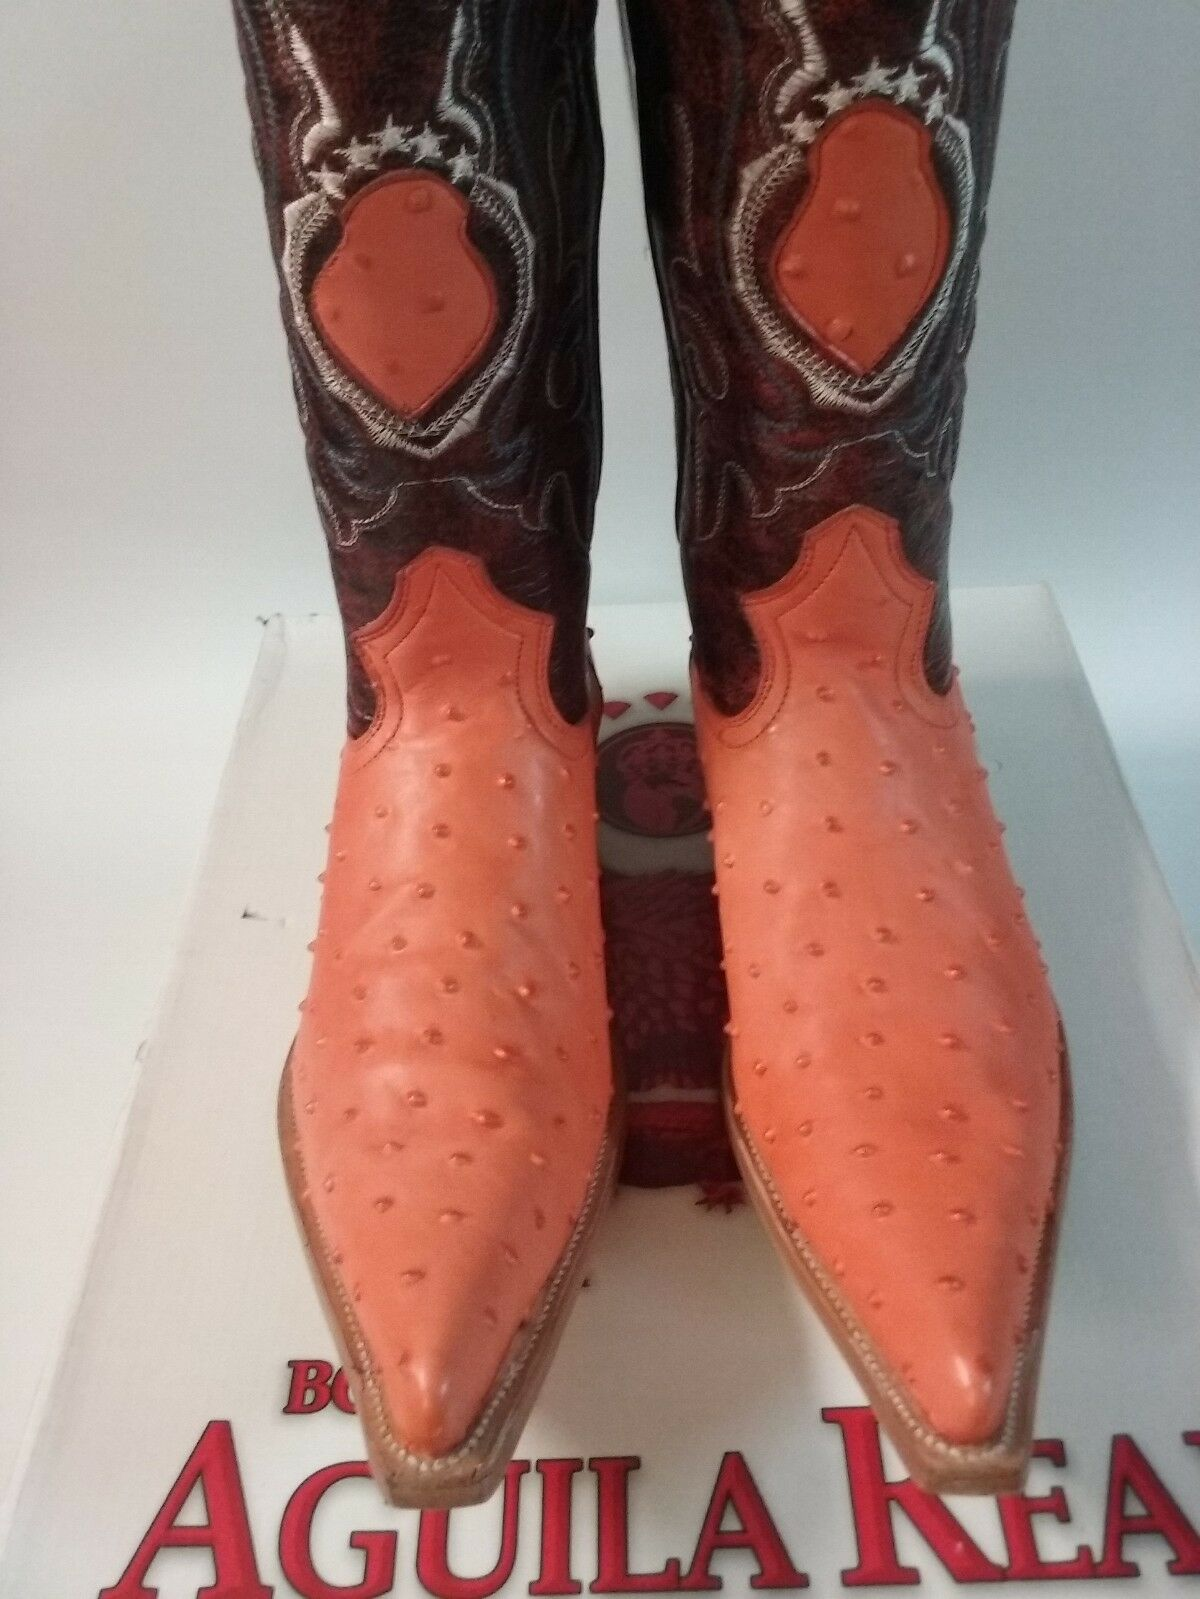 BOTA VAQUERA IMITACION AGUILA REAL  ID 1969 - 980-B PIEL IMIT. AVESTRUZ orange